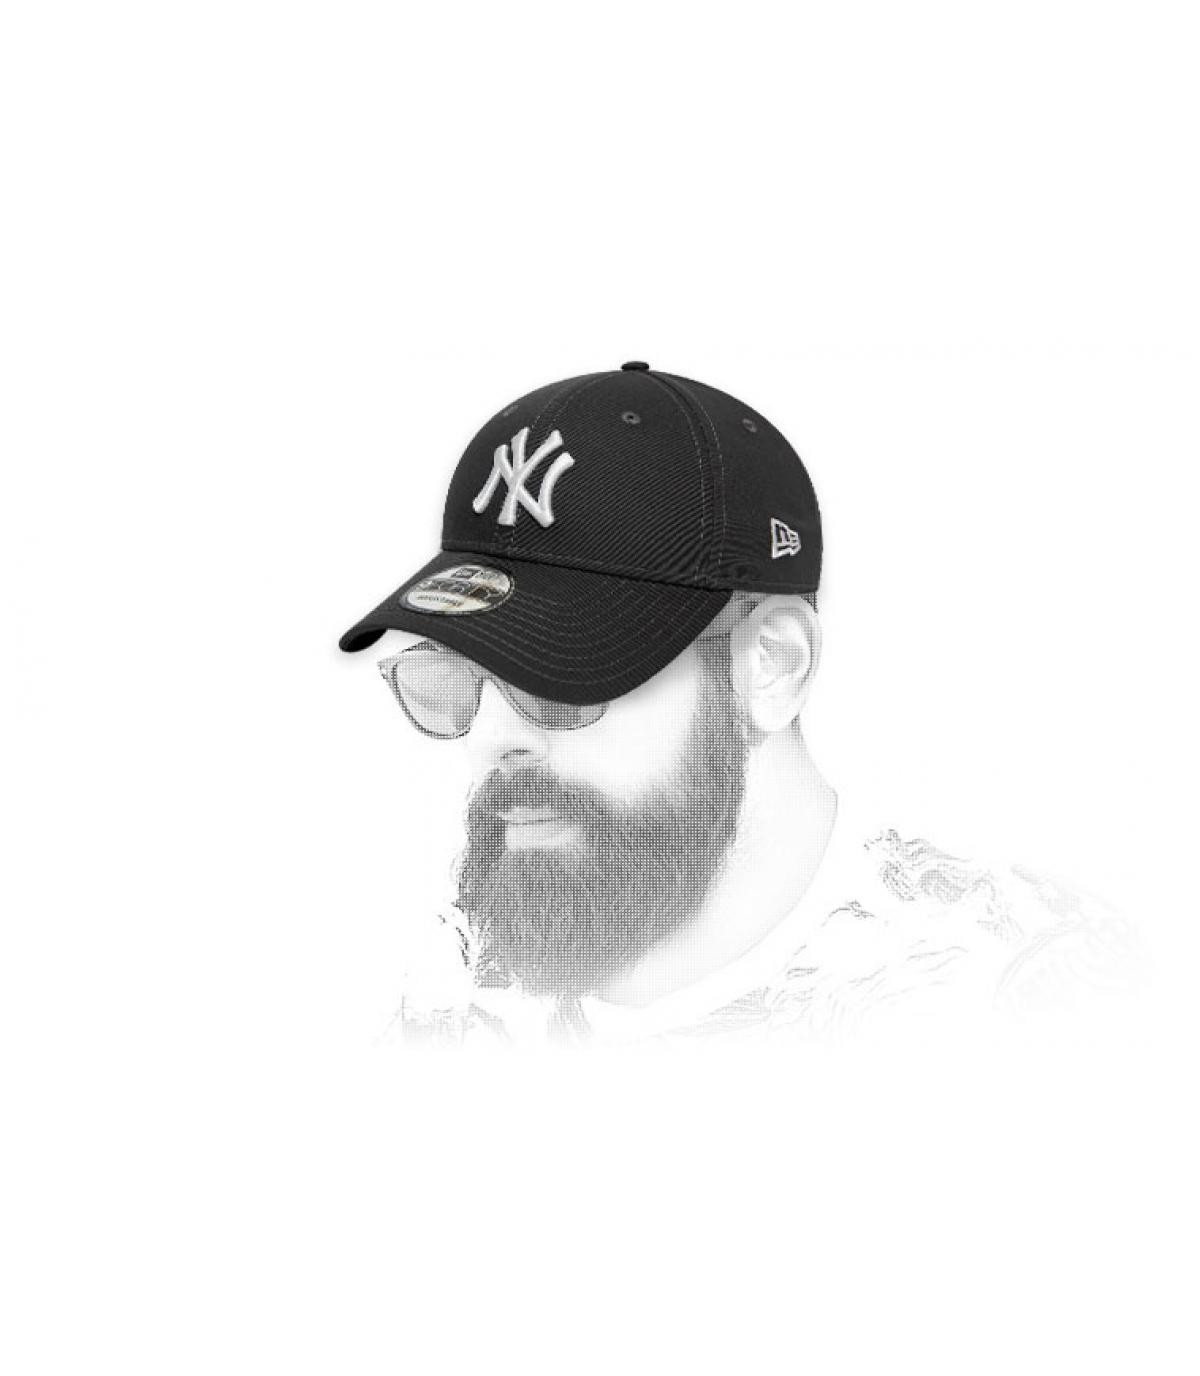 Cappellino NY bianco grigio